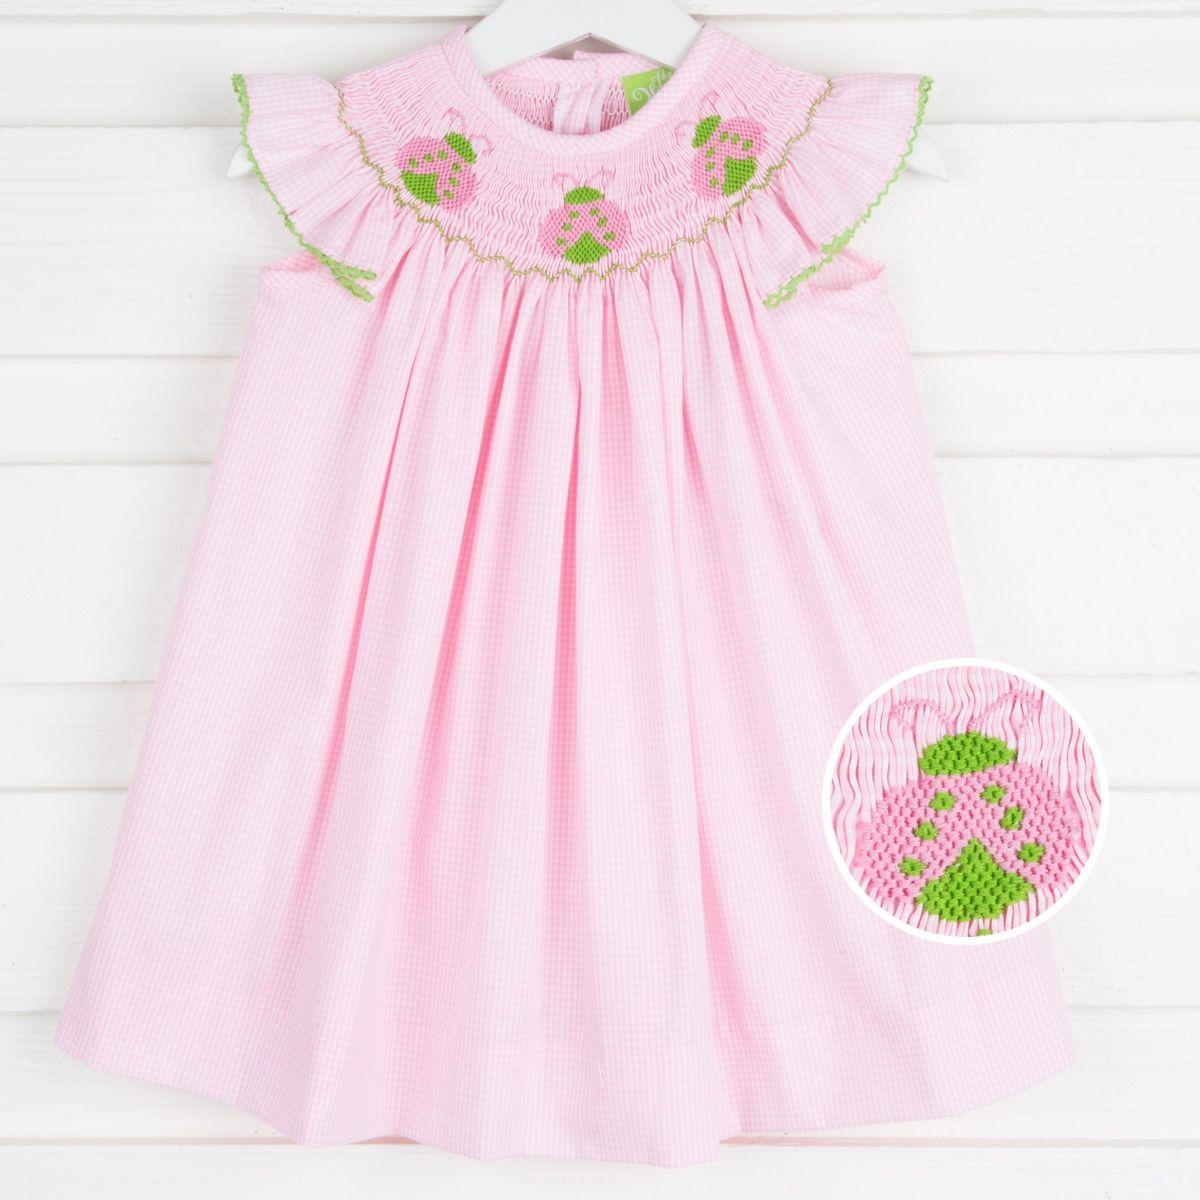 Ladybug Smocked Dress Pink Gingham Pink gingham